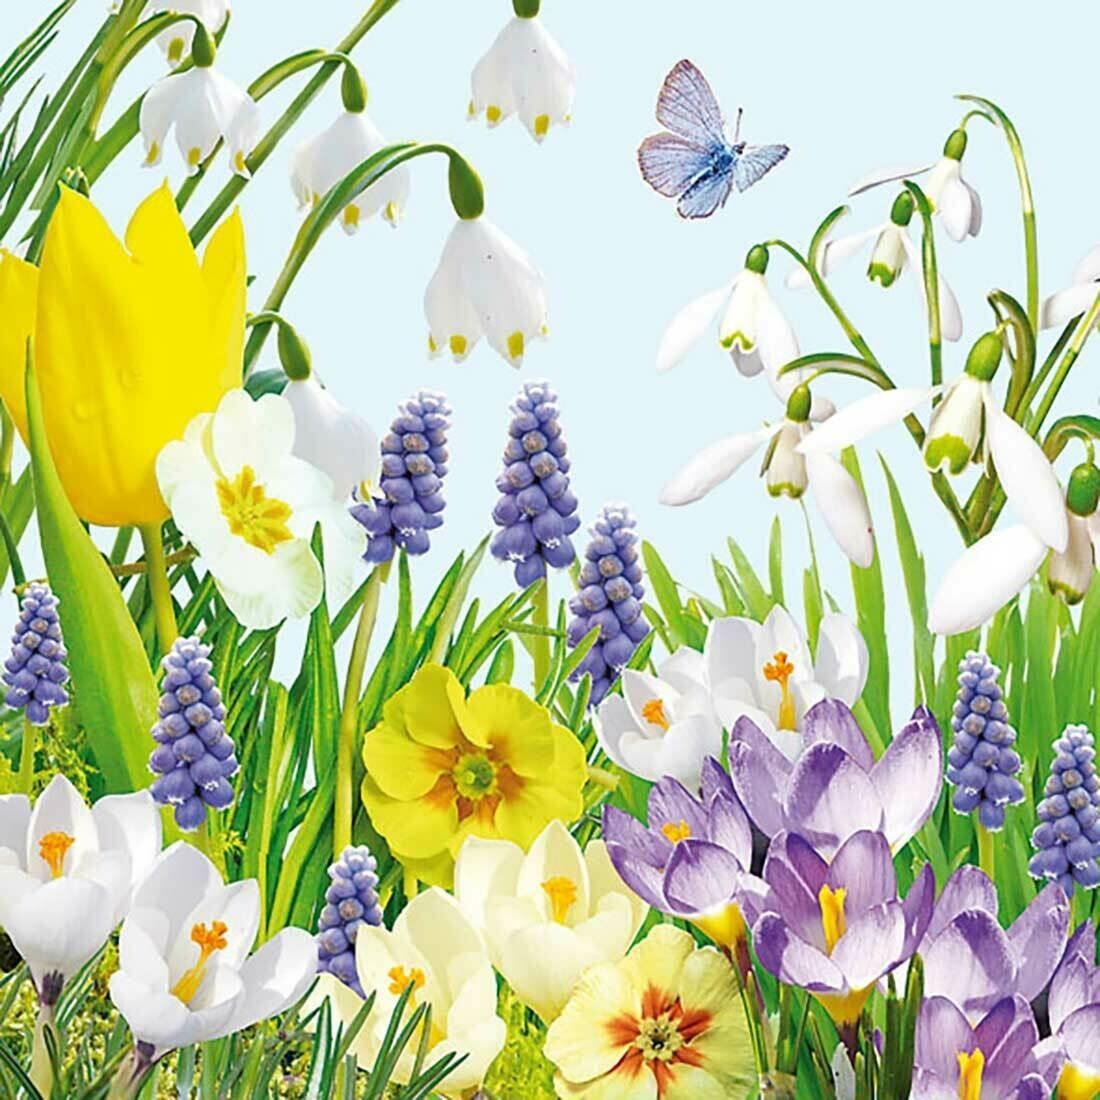 Decoupage Paper Napkins - Floral Spring Time 13x13 (1 Sheet)